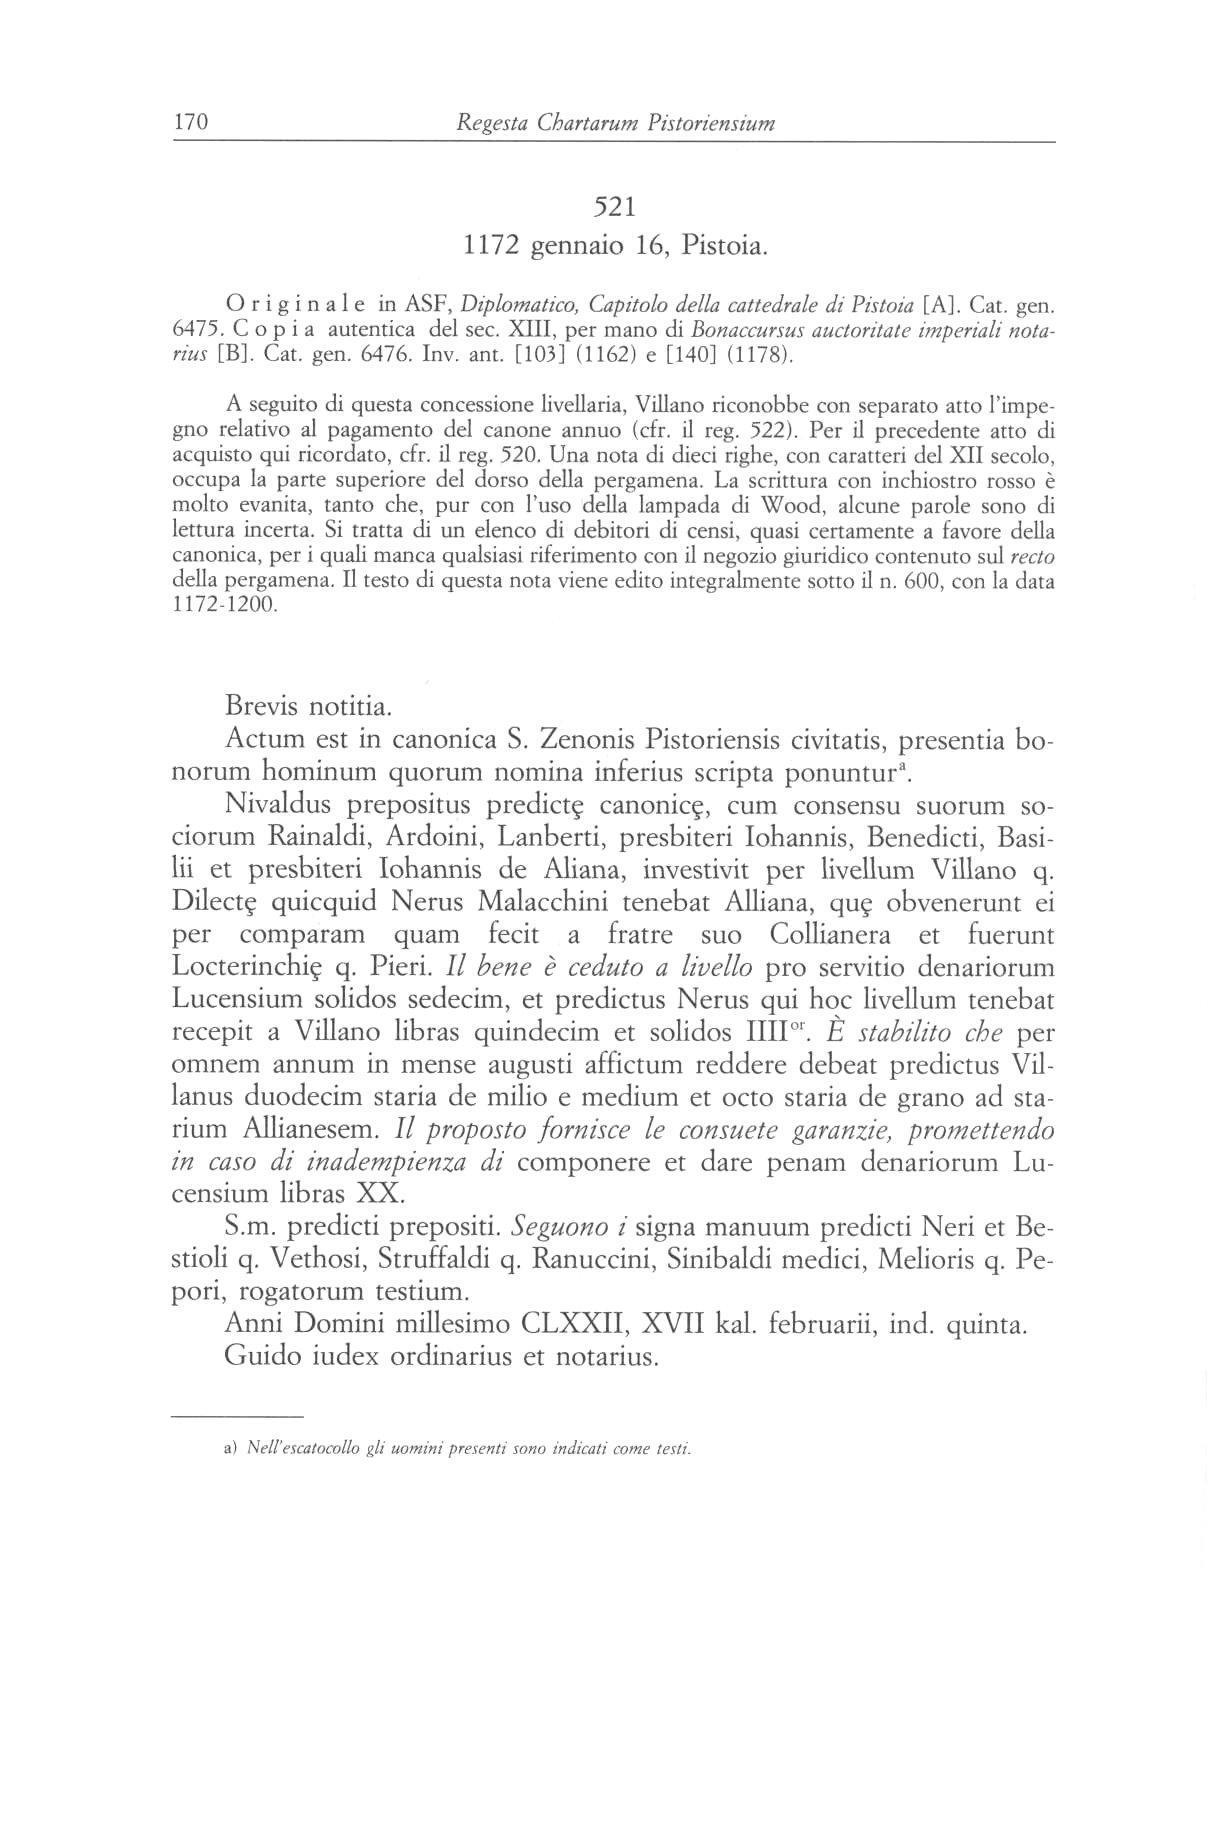 Canonica S. Zenone XII 0170.jpg